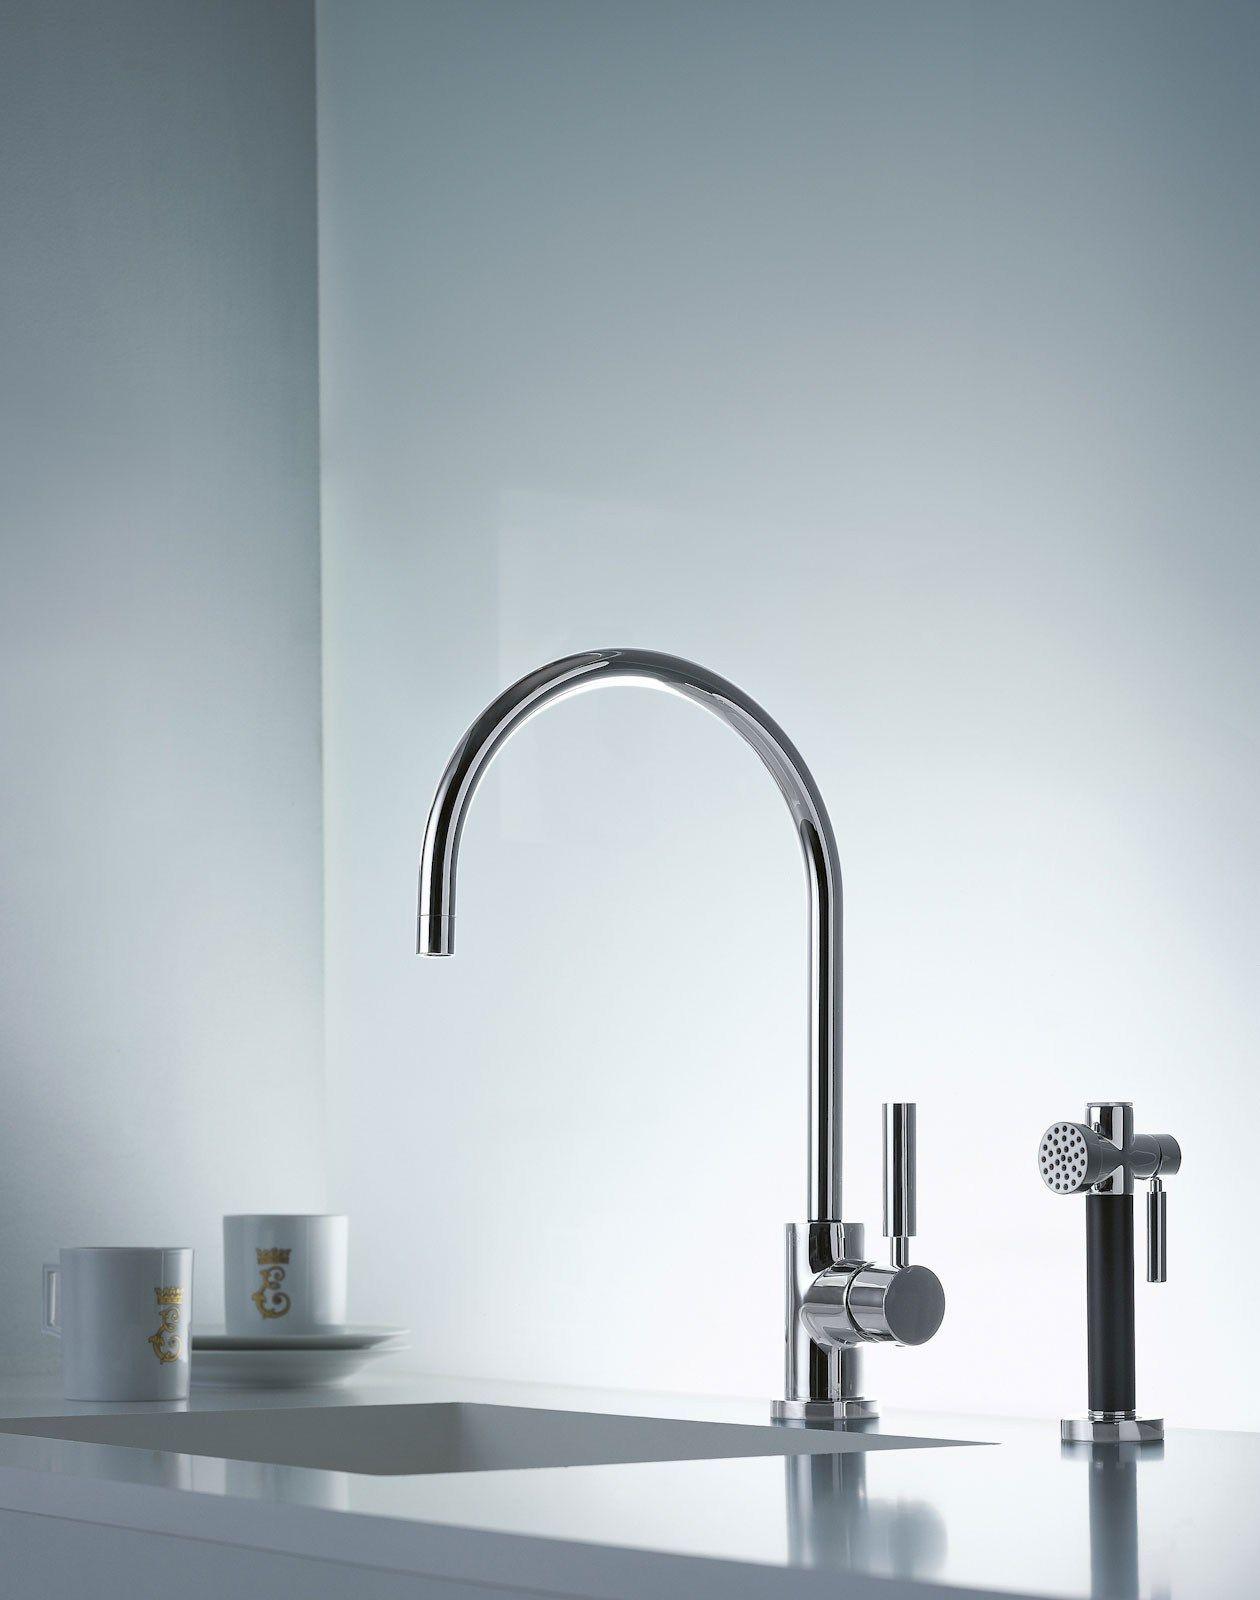 Inspirational Dornbracht Kitchen Faucet Reviews | Kitchen faucets ...